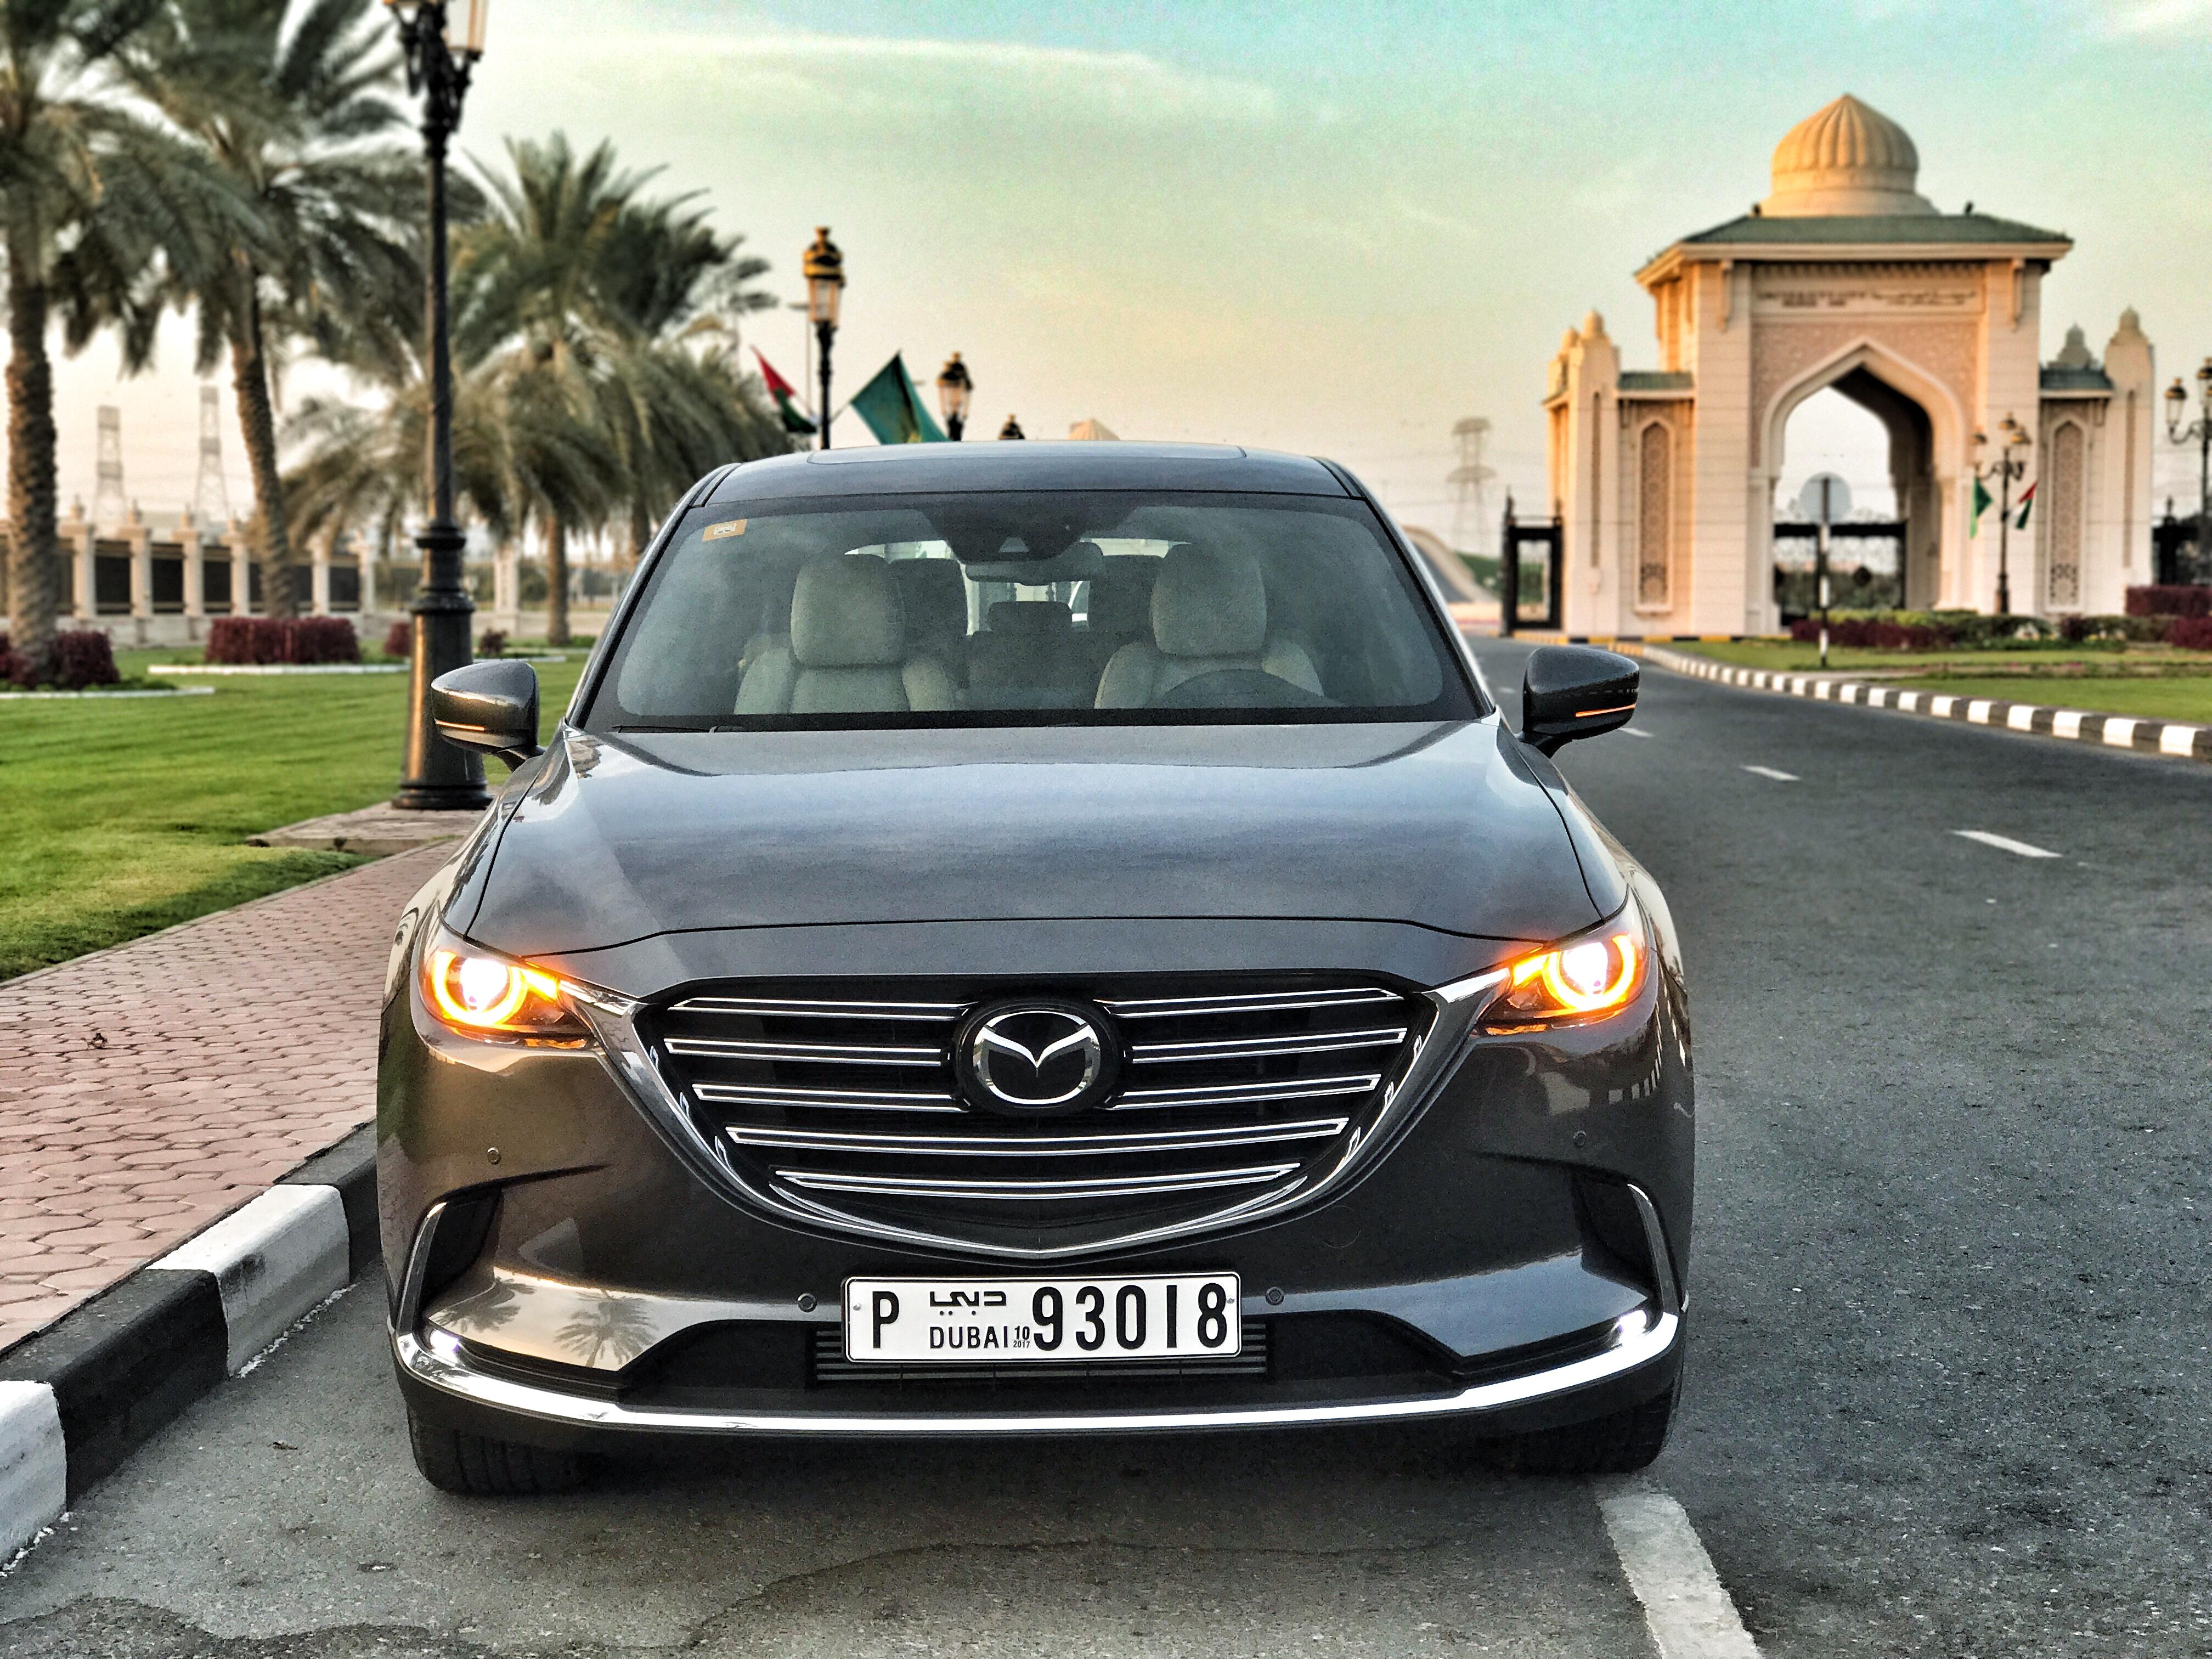 Mazda CX-9 Front Sharjah Unversity City.JPG